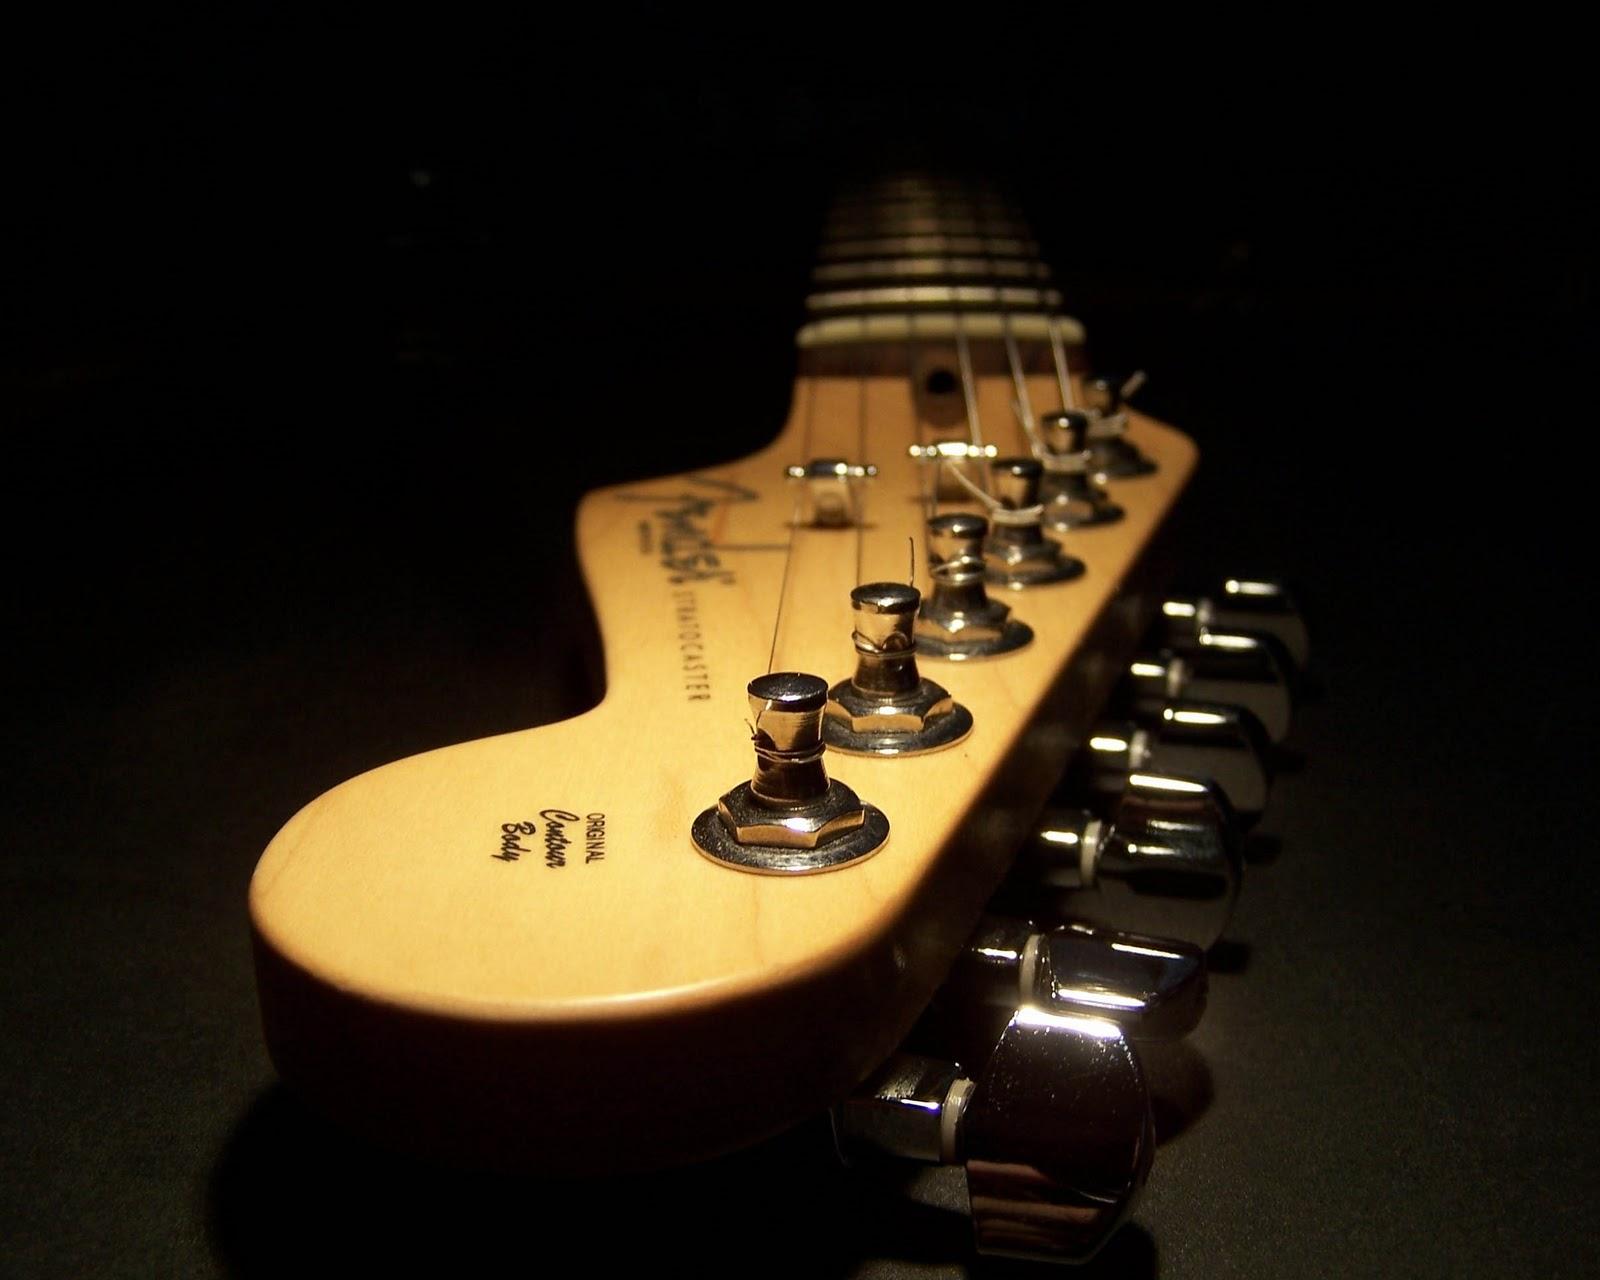 november 2010 â great guitar sound